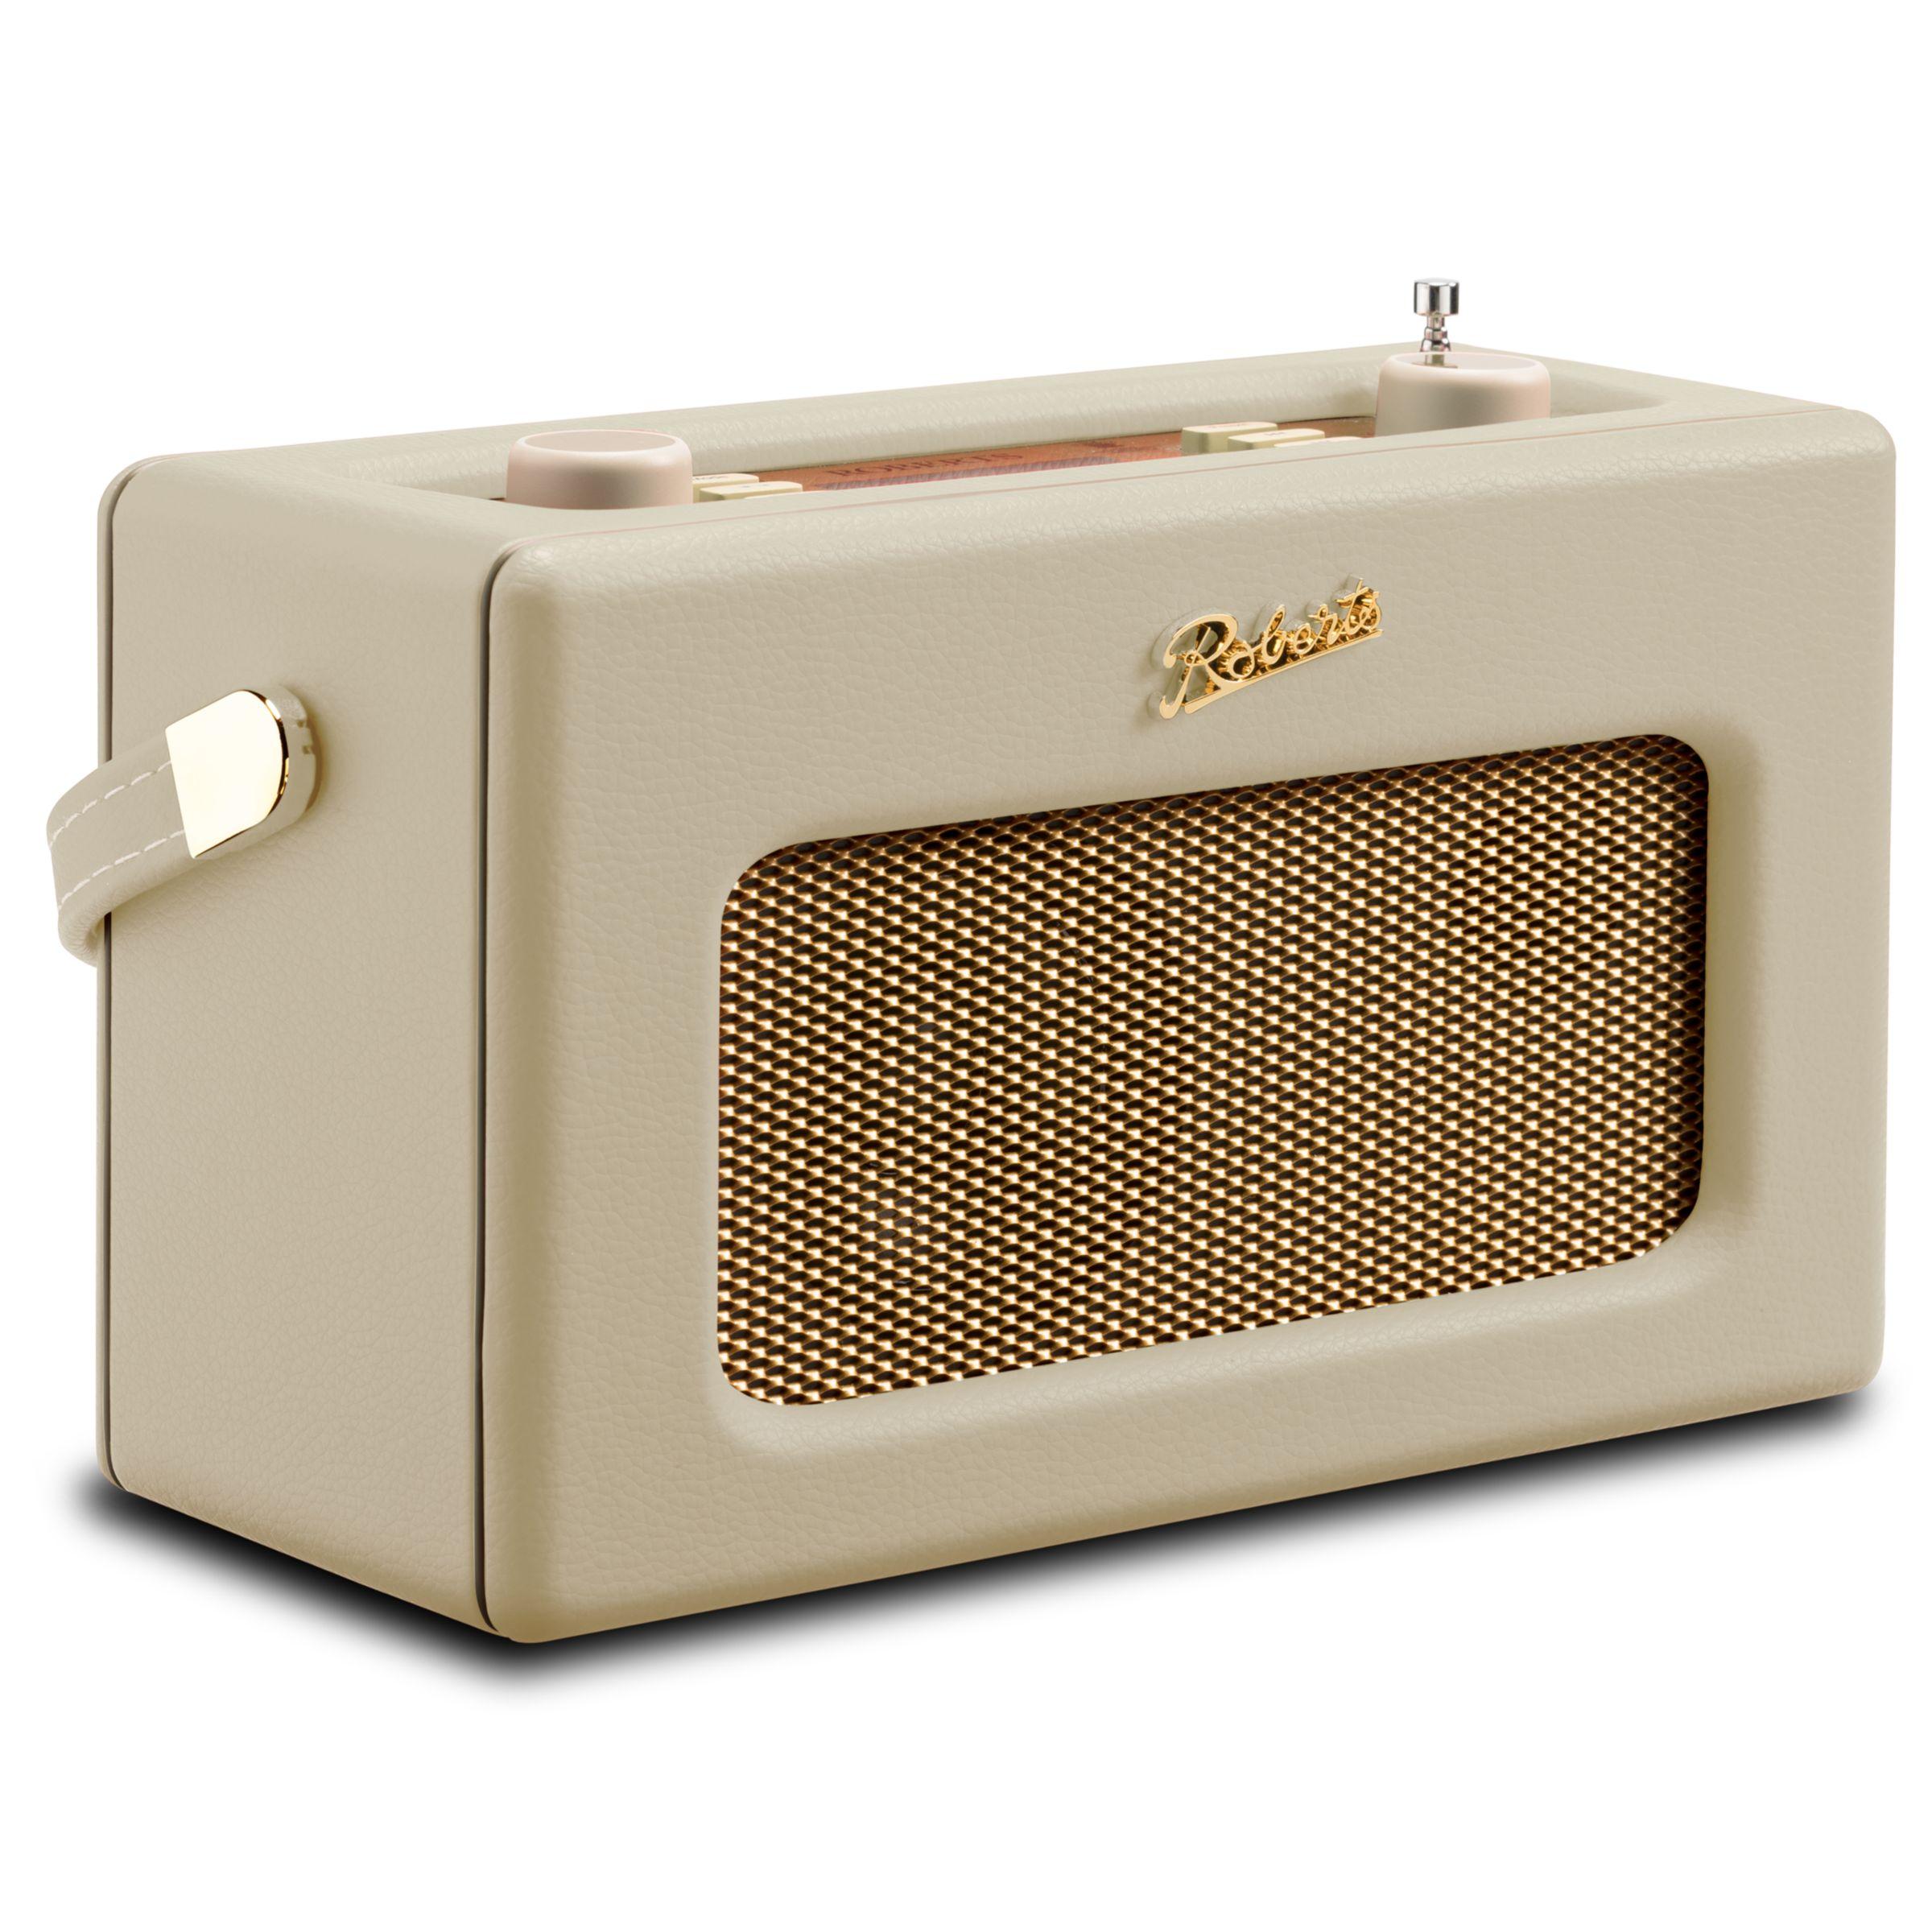 Roberts ROBERTS Revival RD70 DAB/DAB+/FM Bluetooth Digital Radio with Alarm